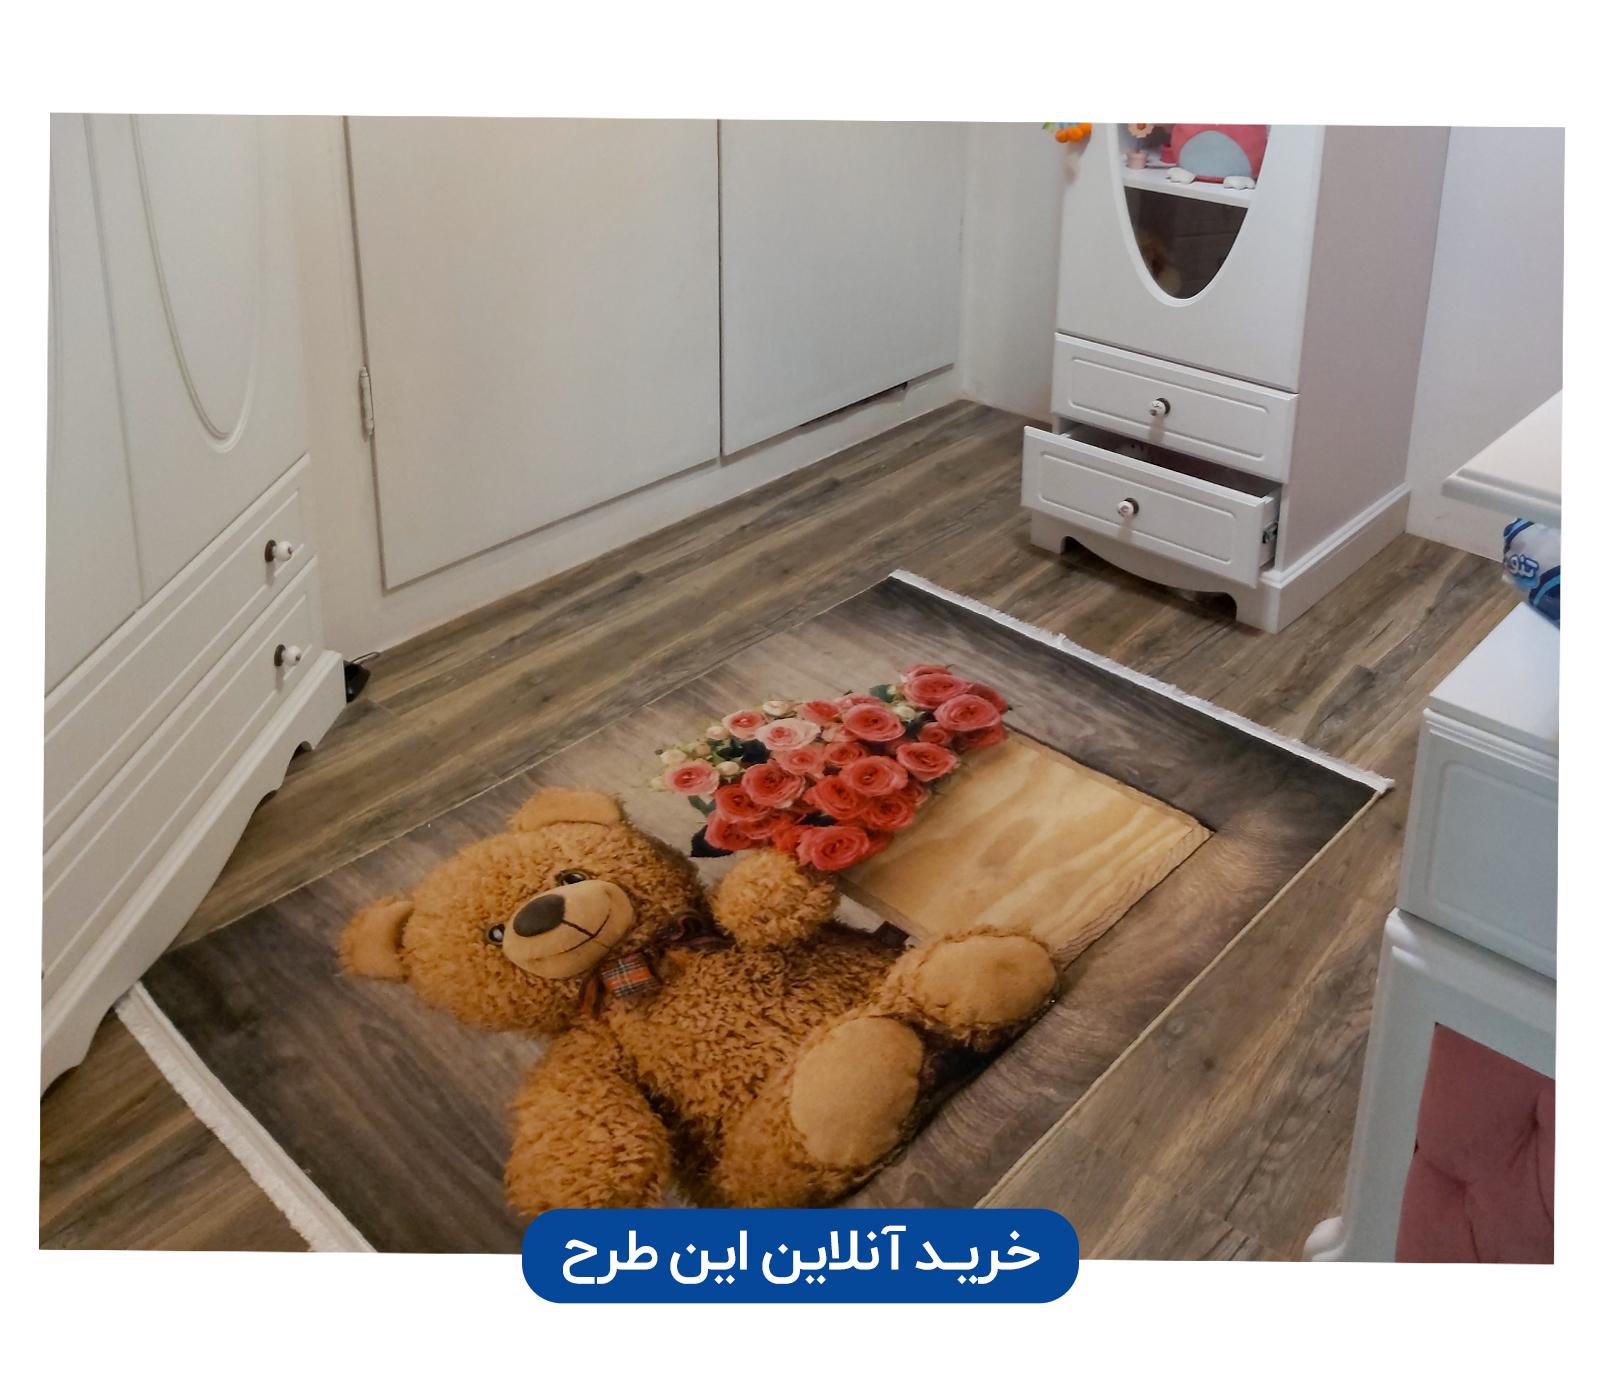 طرح فرش کودک